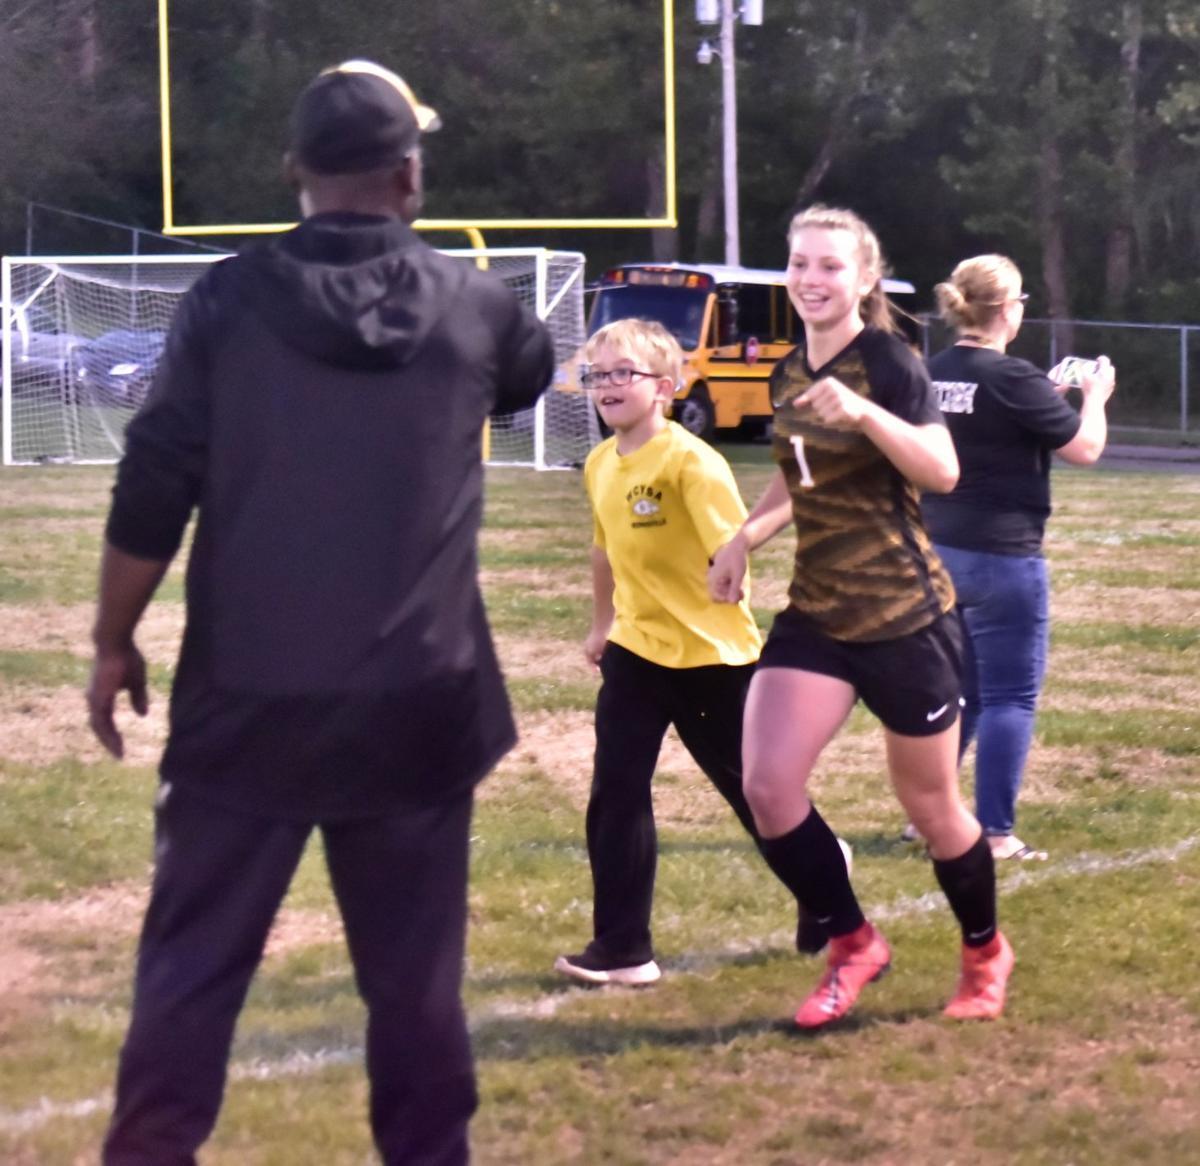 Dellarose to play soccer at UNC